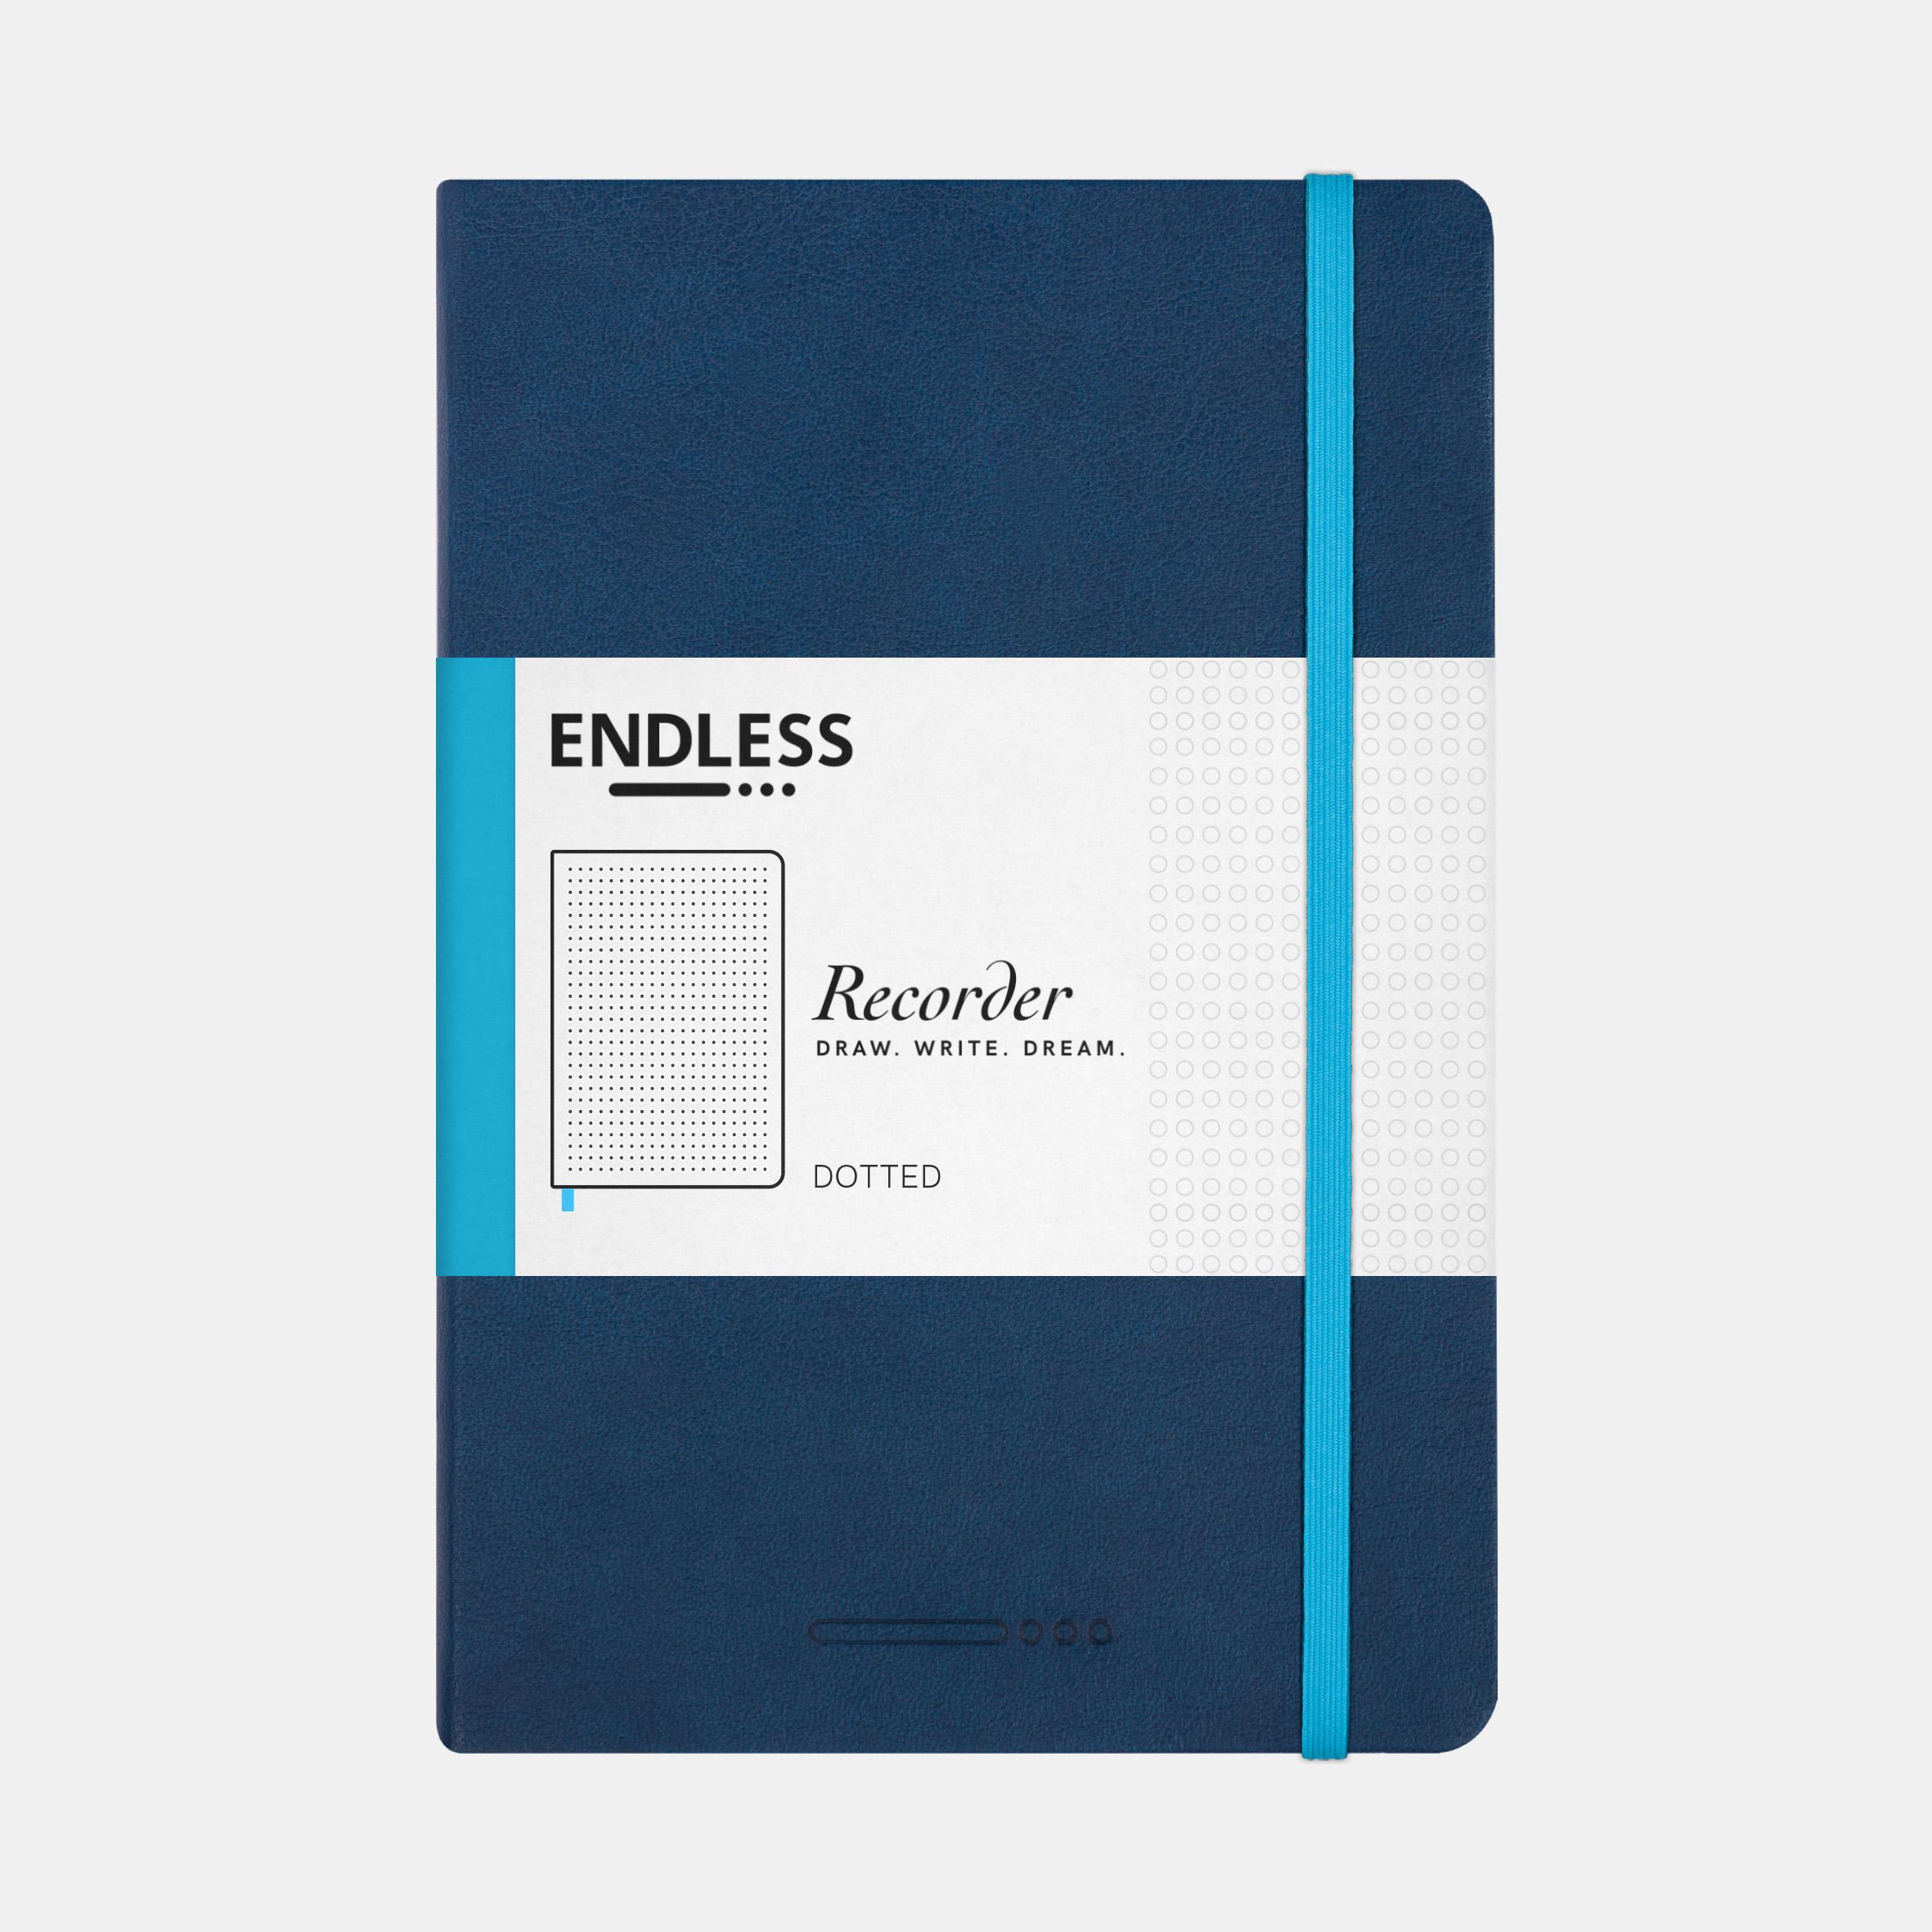 Endless Recorder Notebook